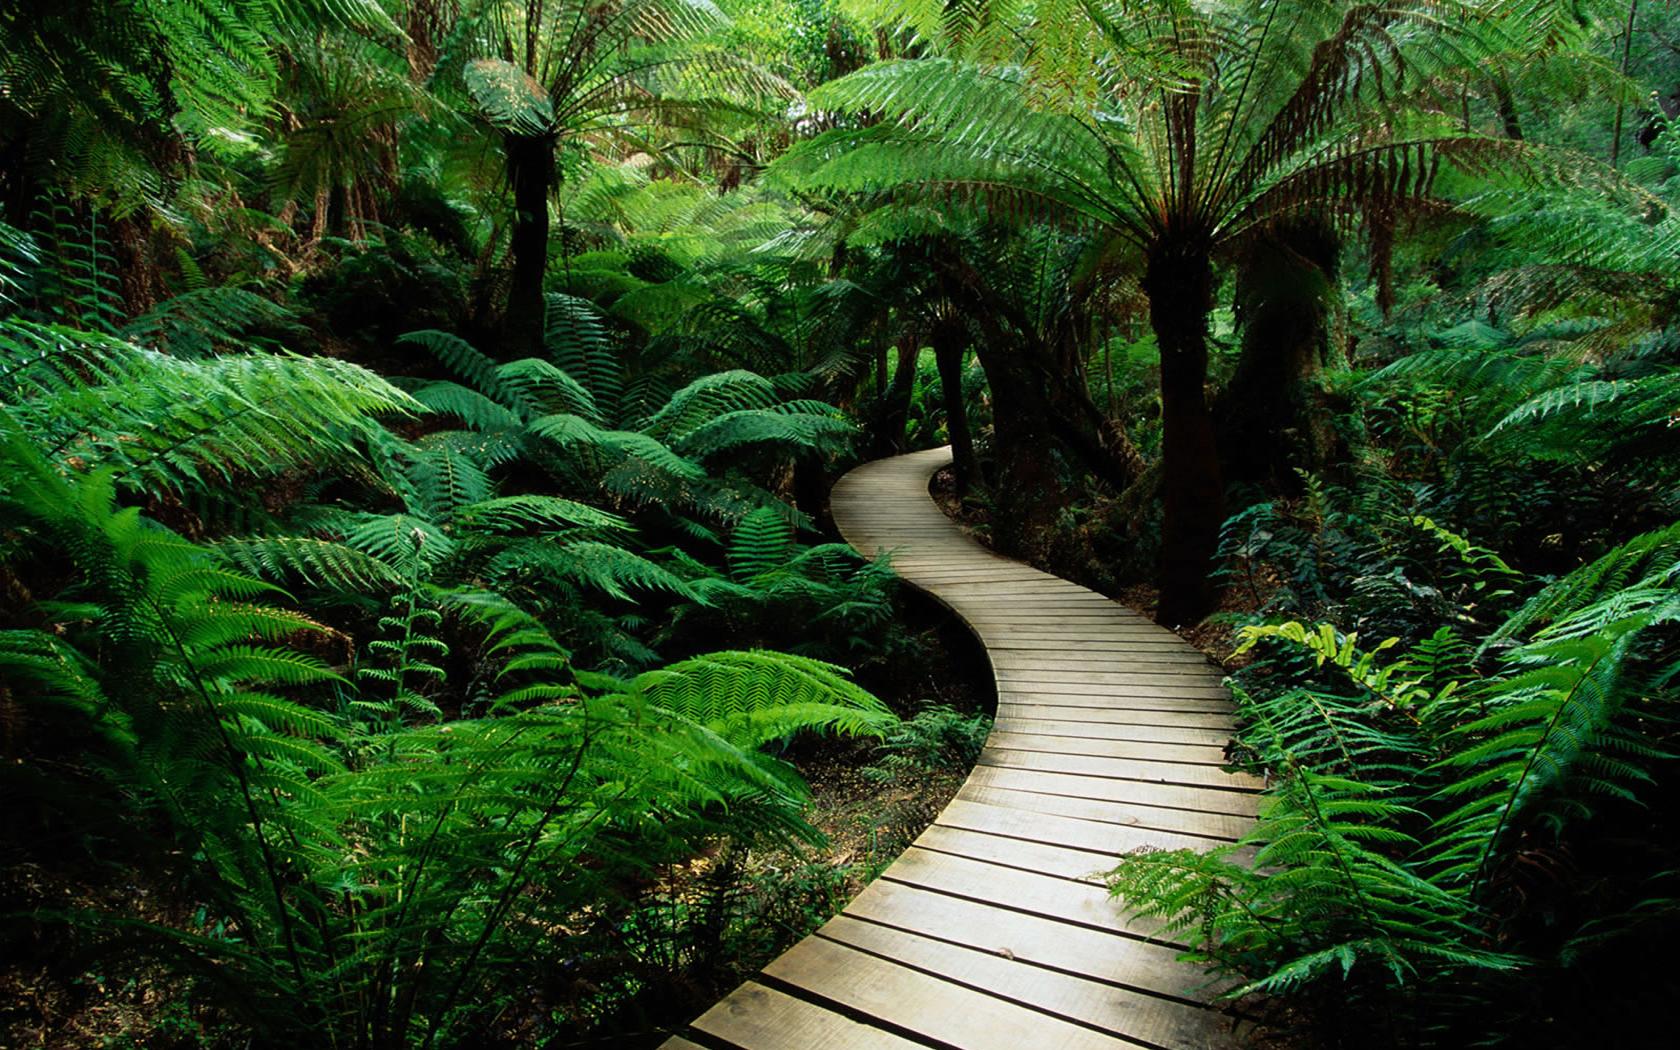 Green nature 1680 x 1050 download close